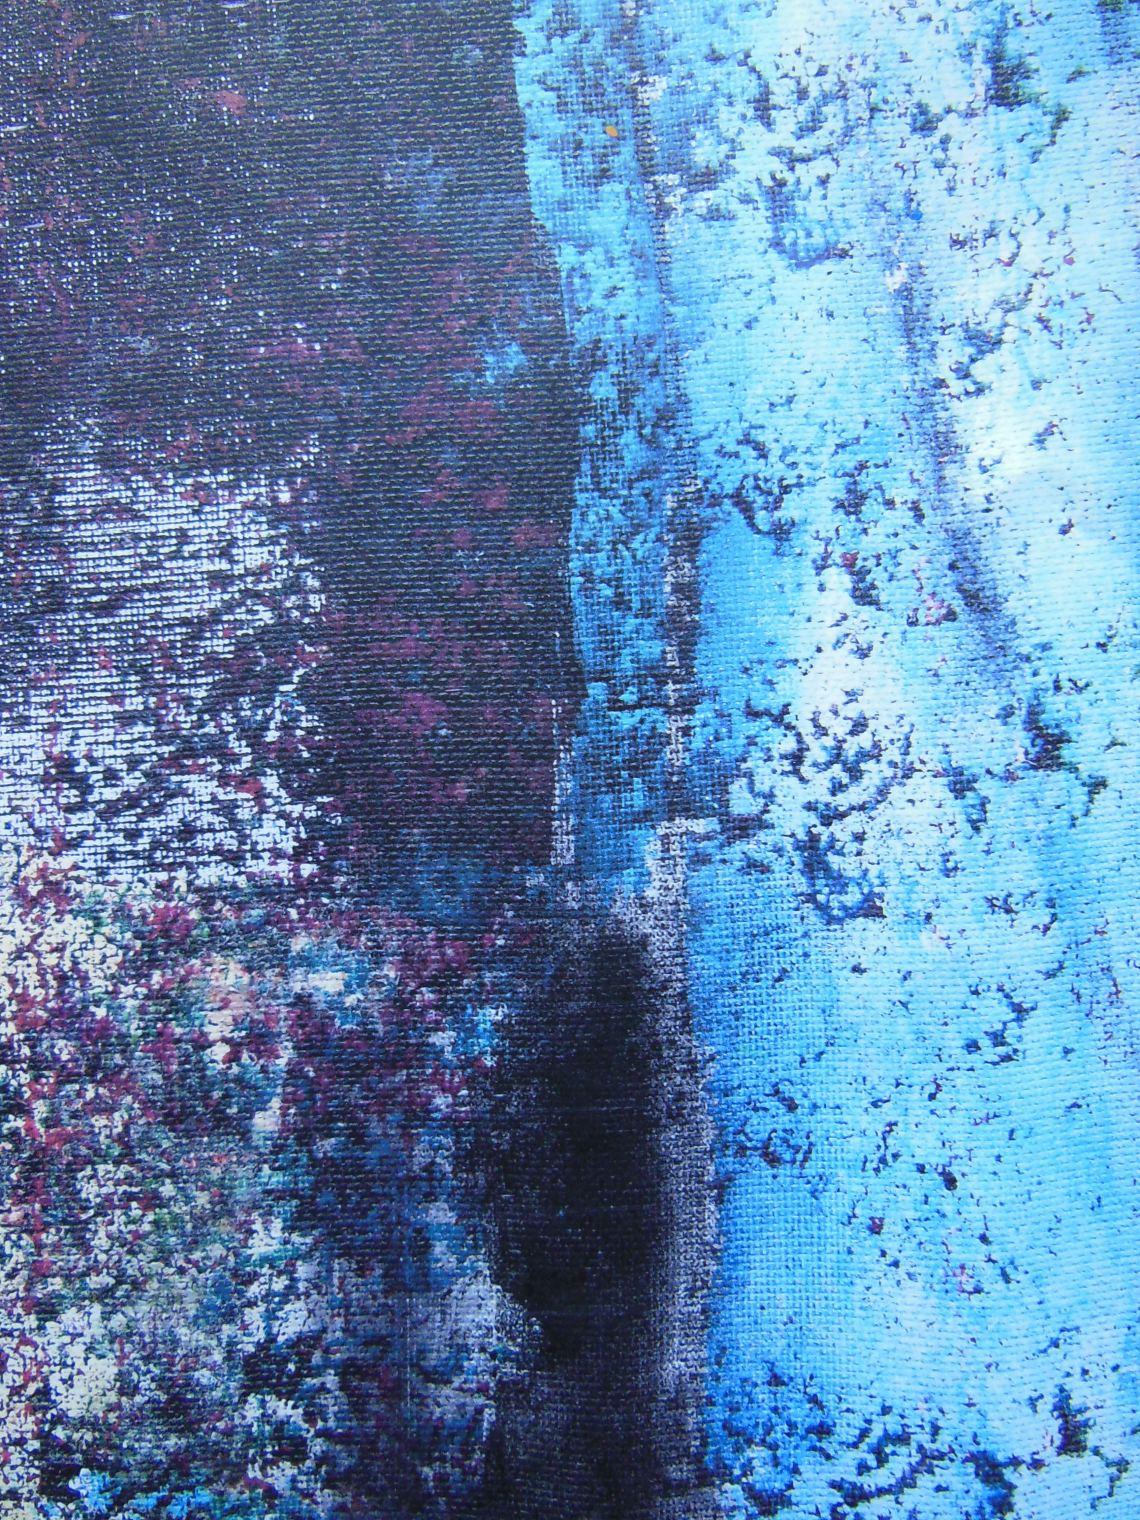 20x16 washed canvas acrylic